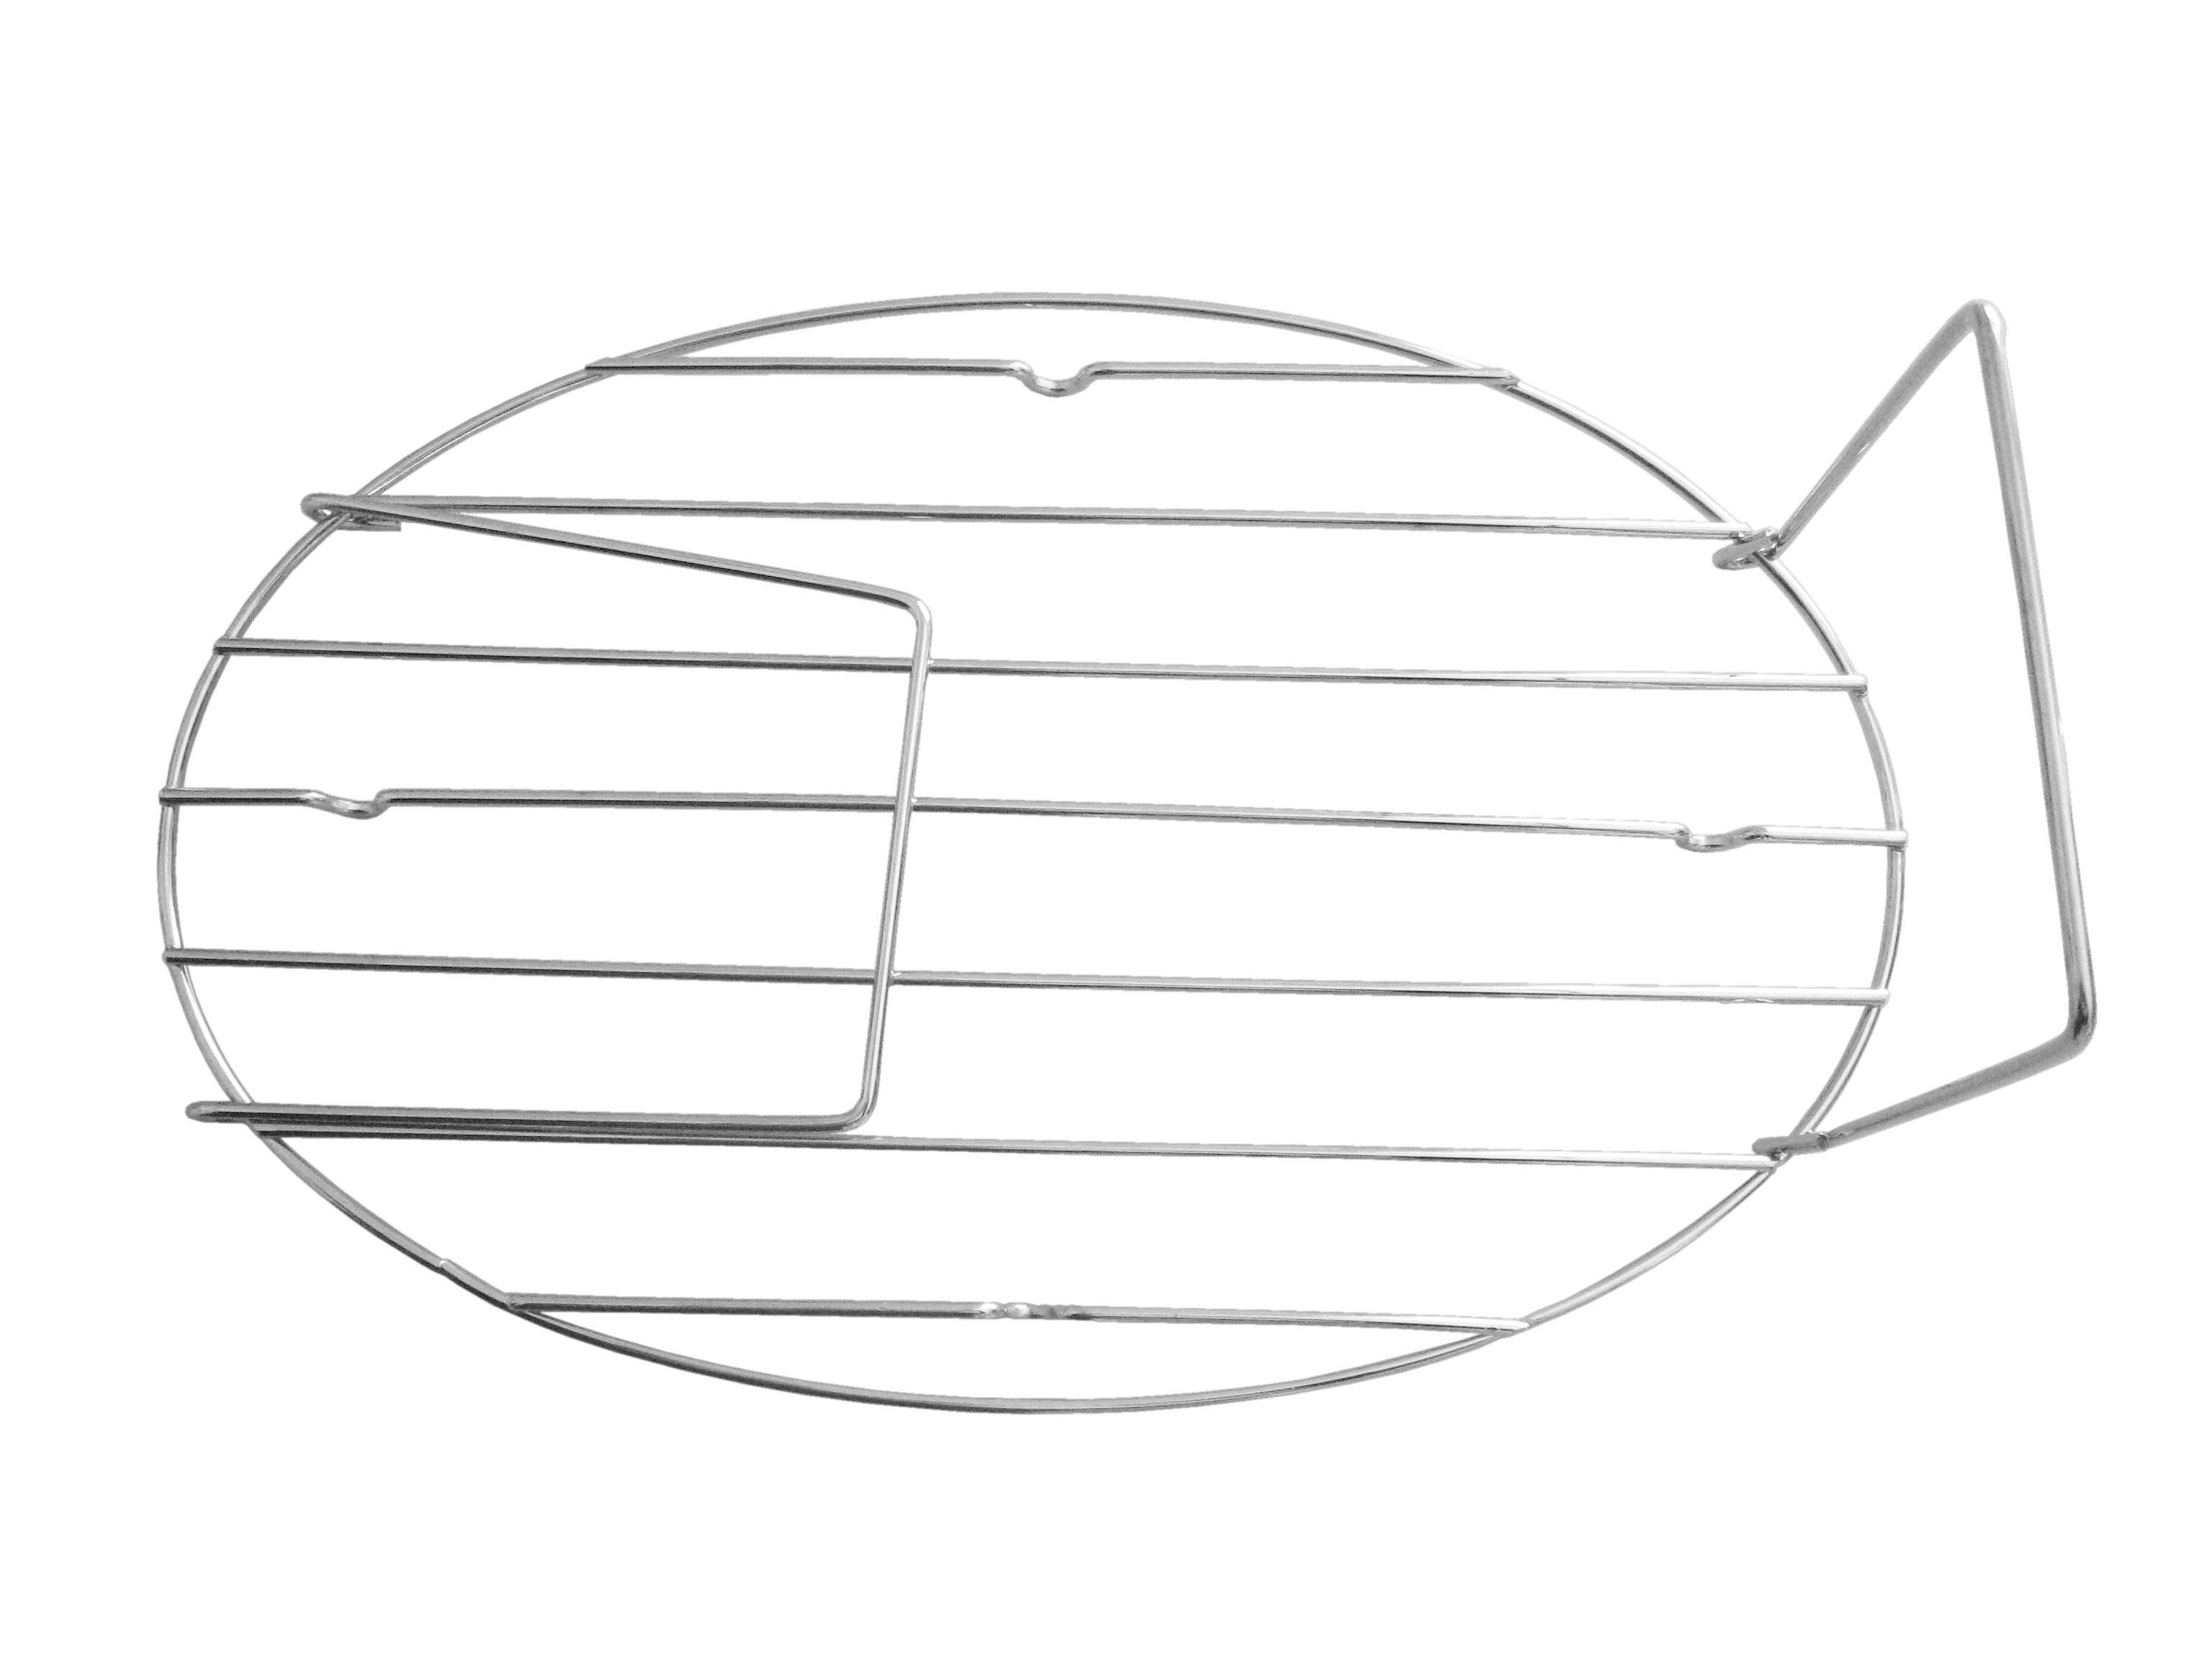 Grille pour roaster moyen modèle